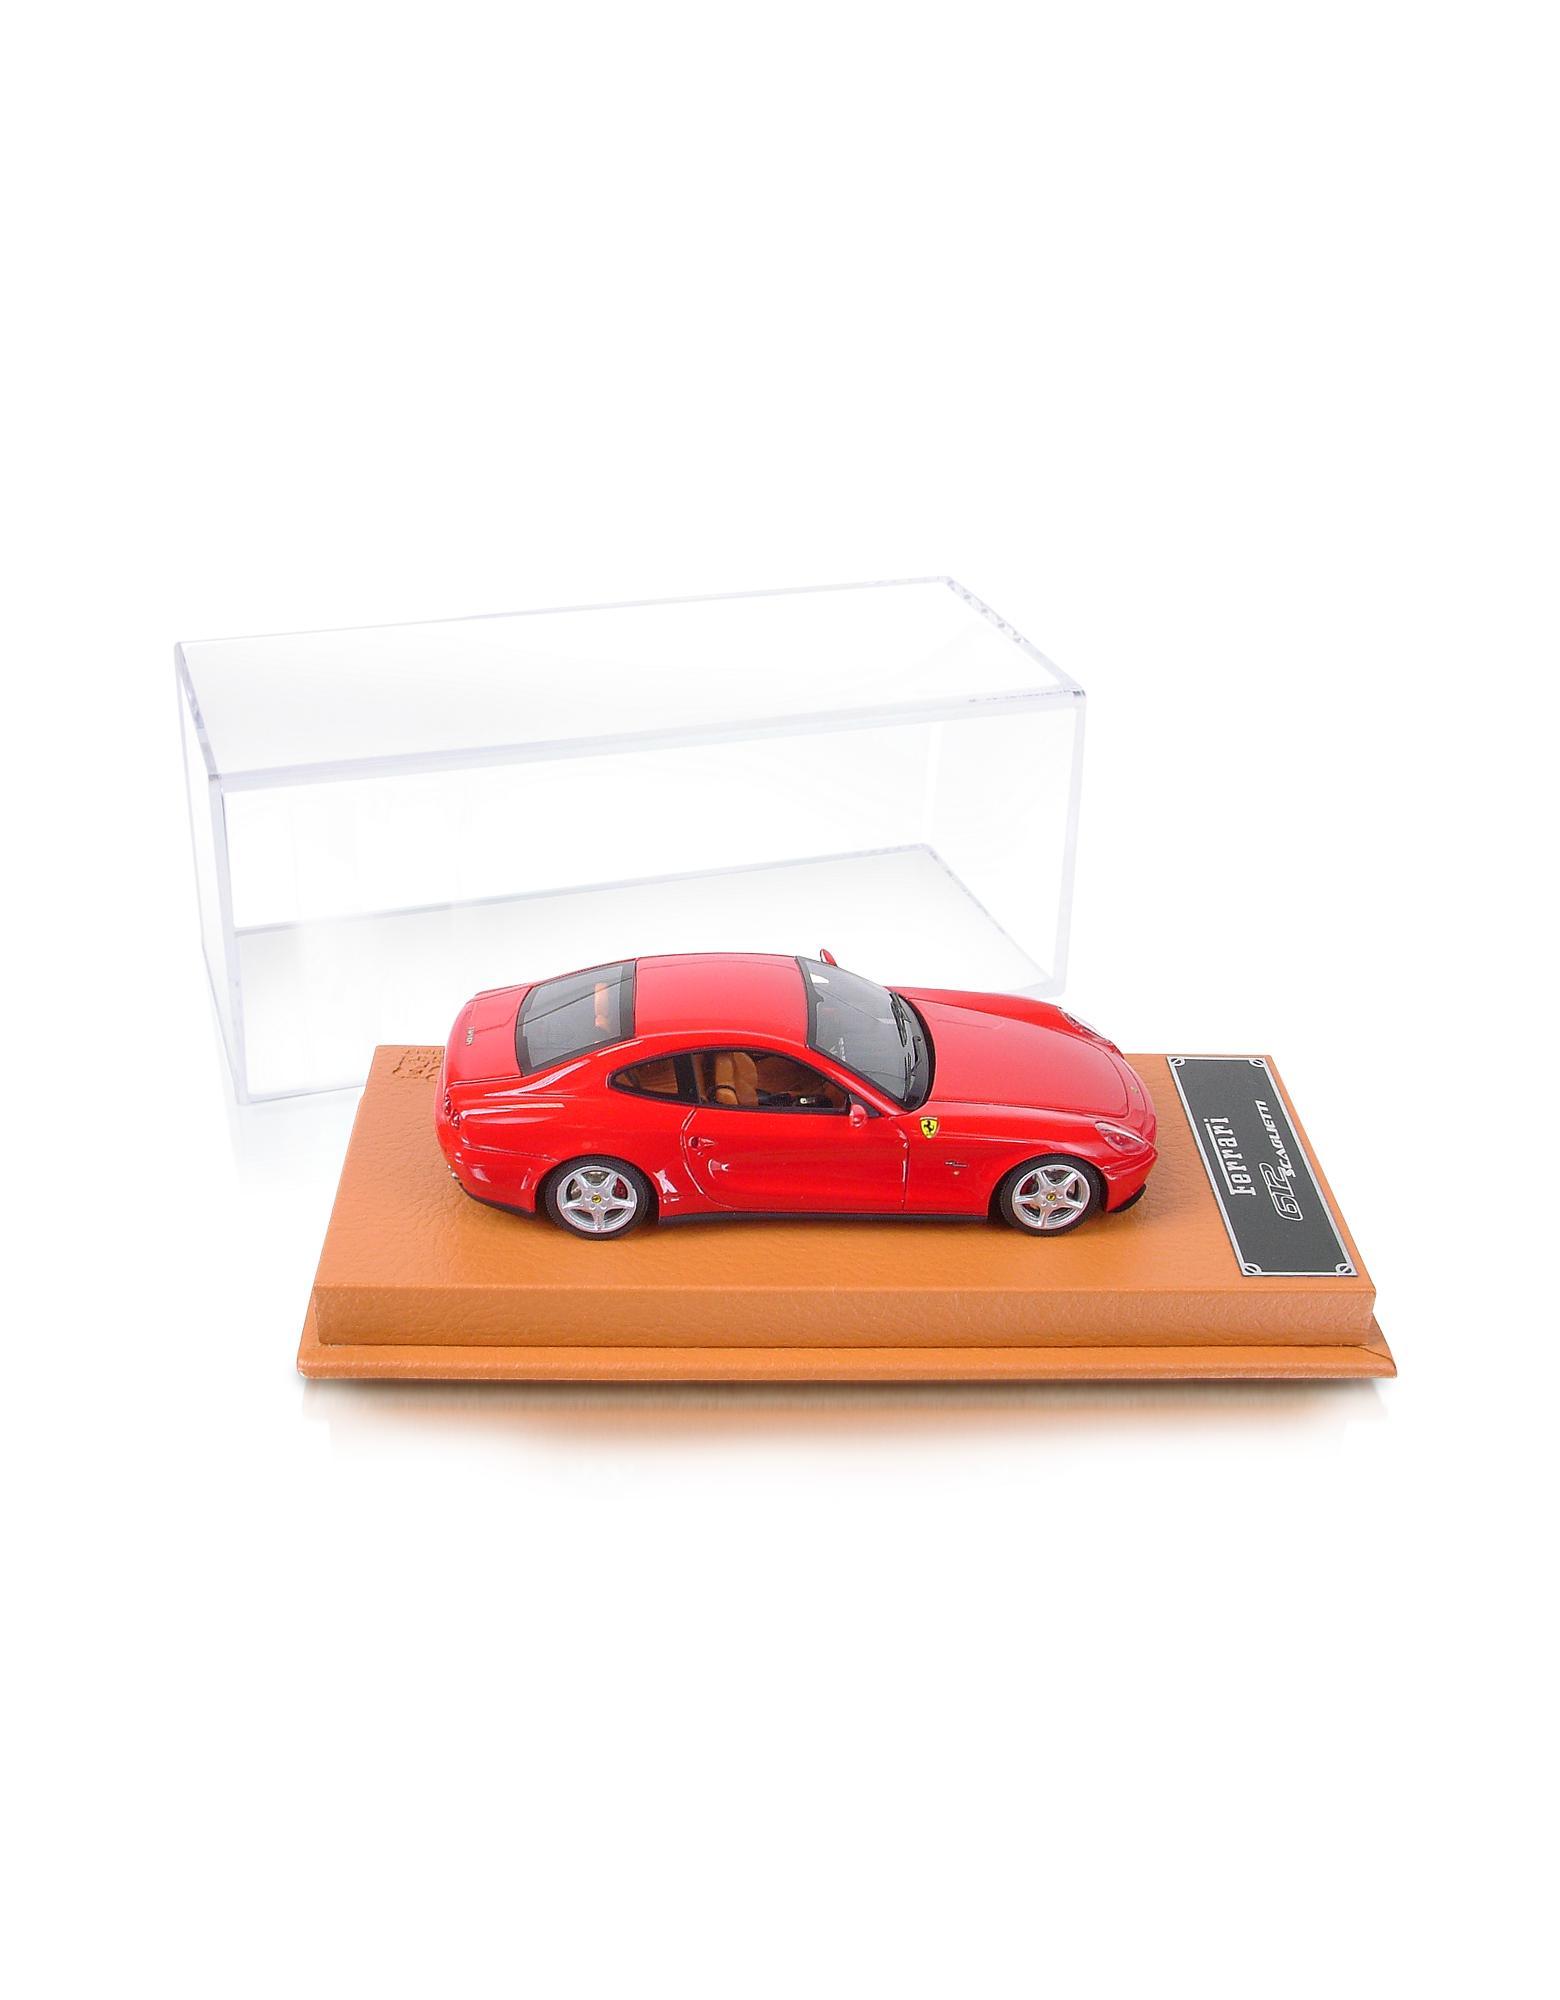 Ferrari  Ferrari 612 Scaglietti Model in Scale 1:43